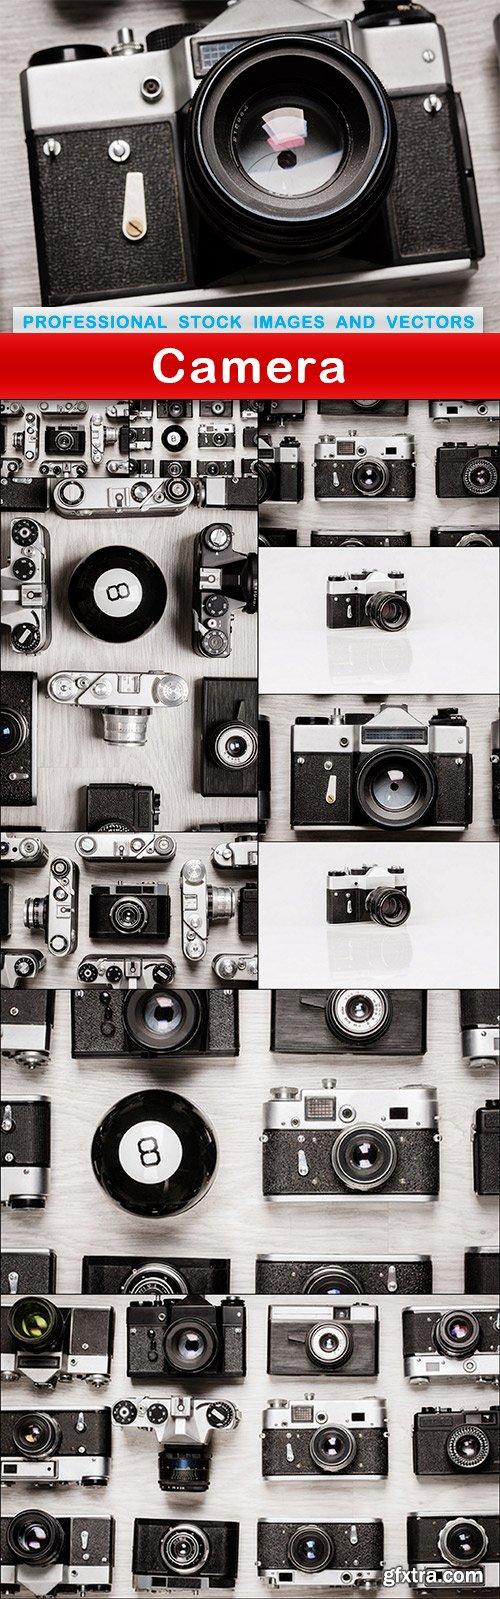 Camera - 11 UHQ JPEG